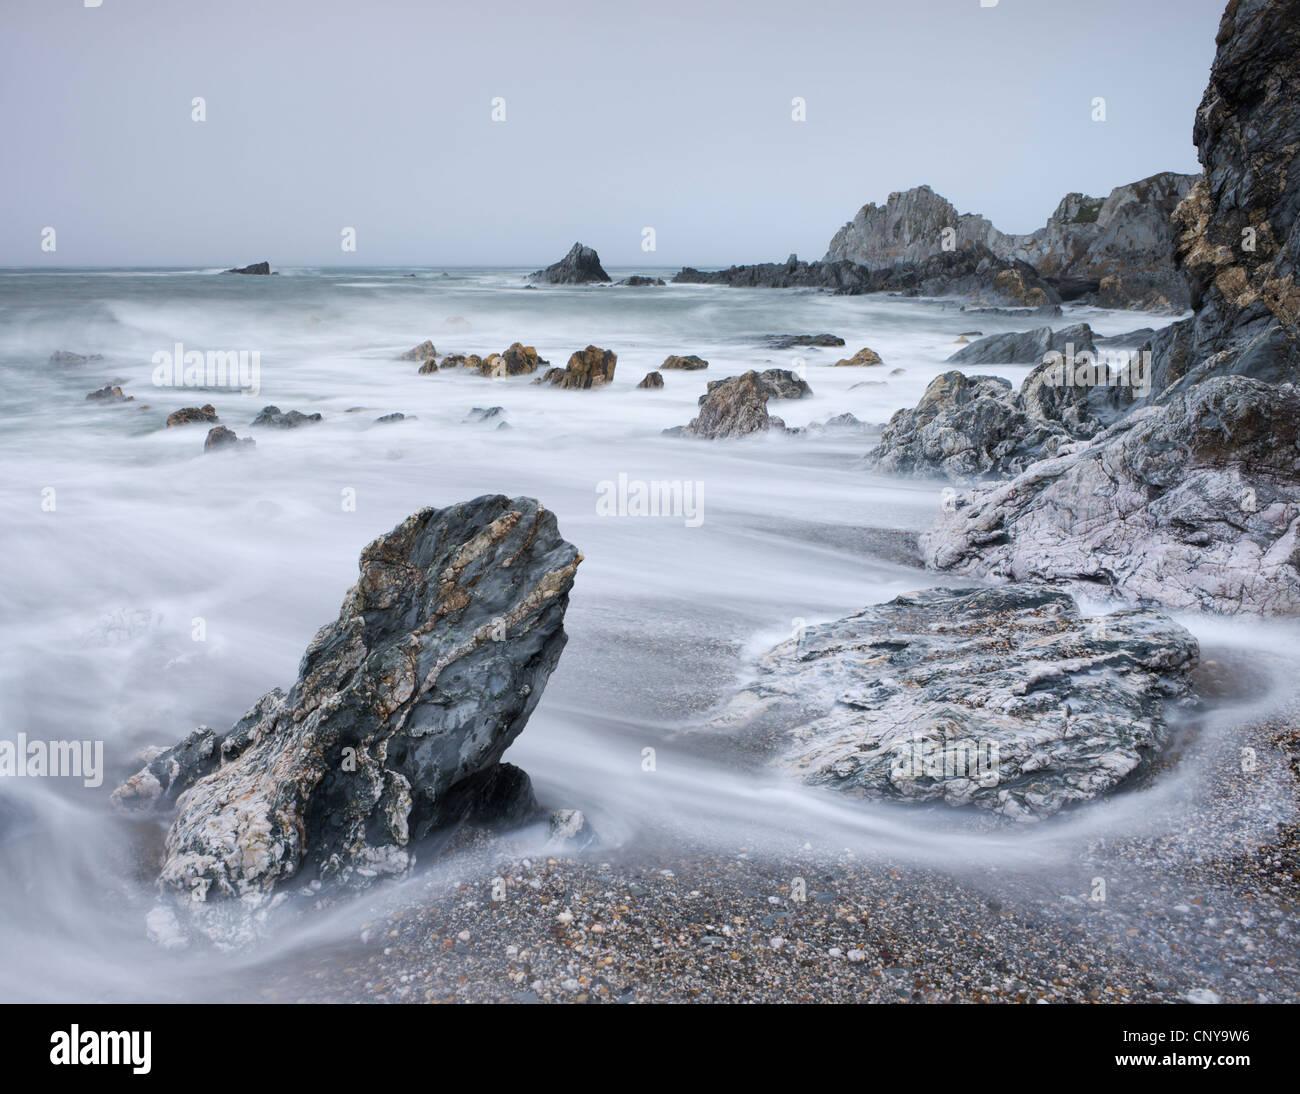 Rocky shore of Rockham Bay near Morte Point, North Devon, England. Summer (June) 2010. - Stock Image